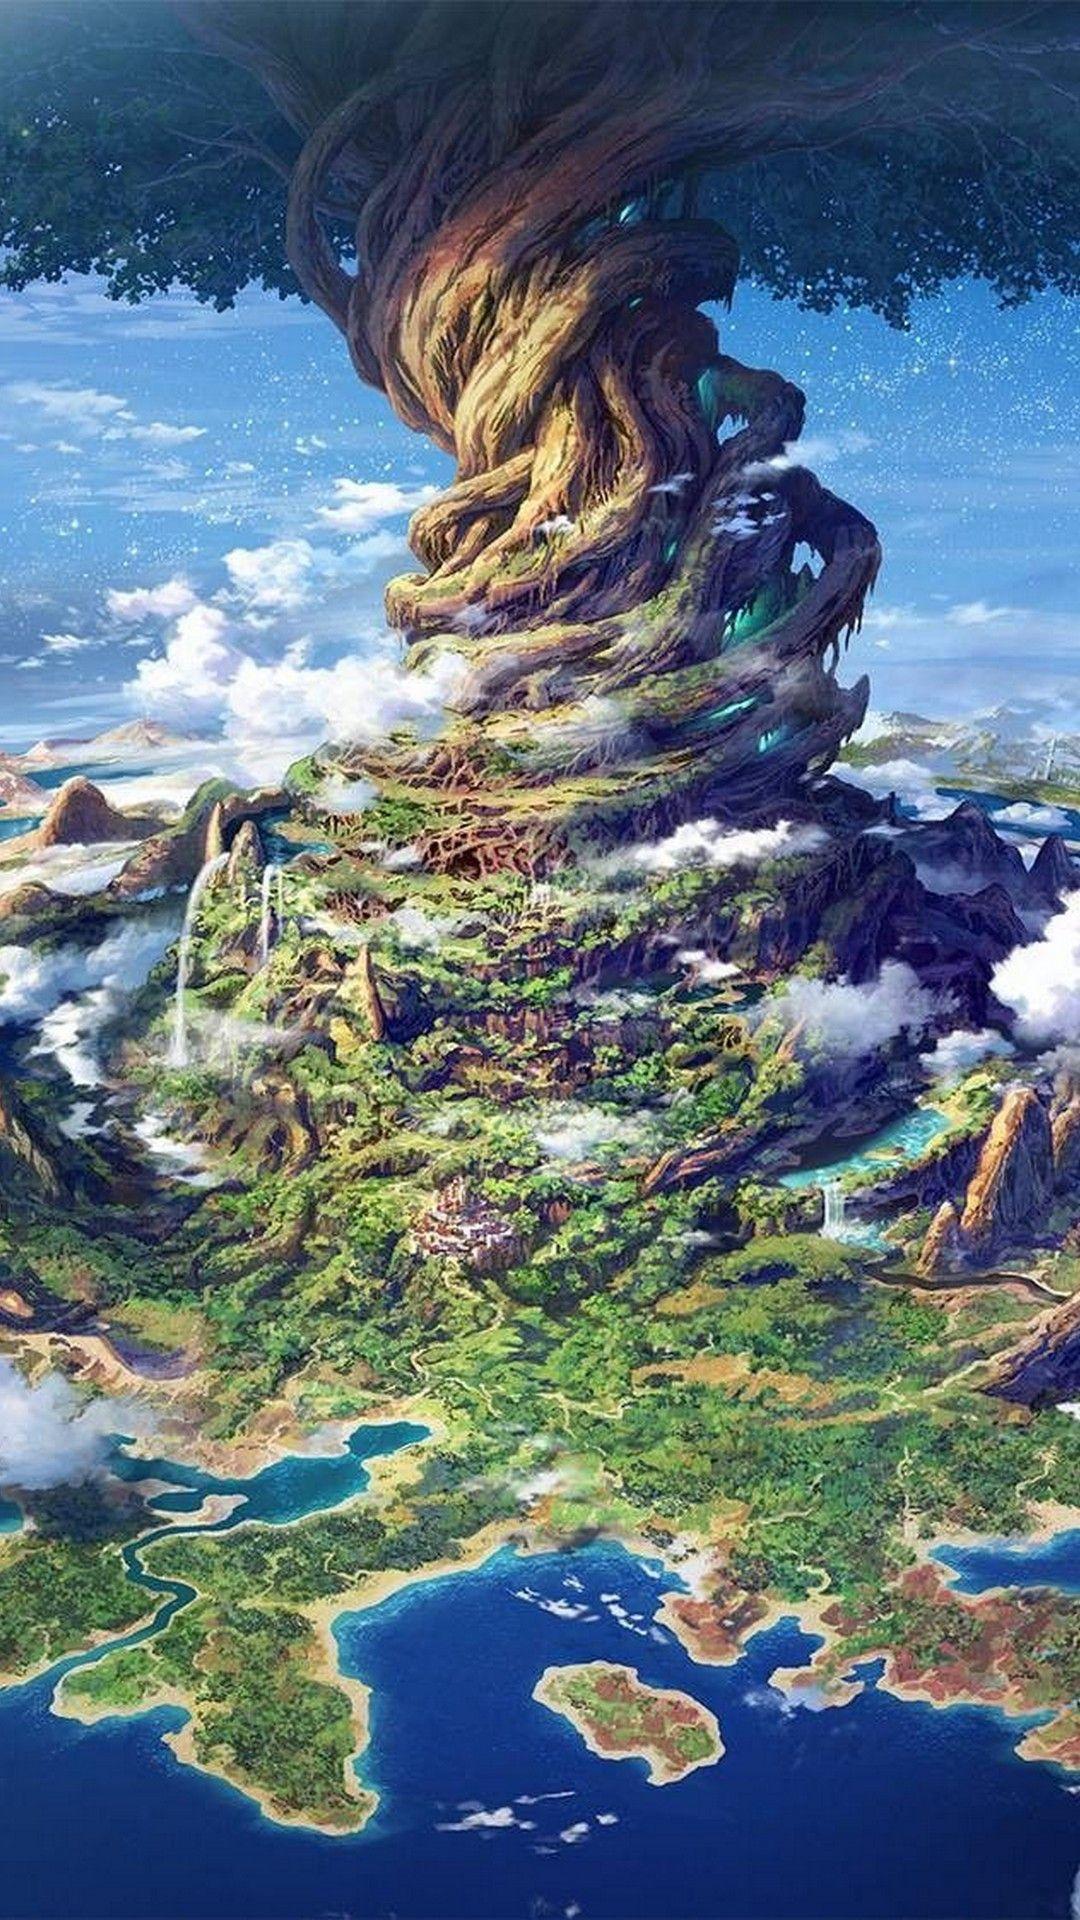 Fantasy iPhone 8 Wallpaper Fantasy landscape, Tree art